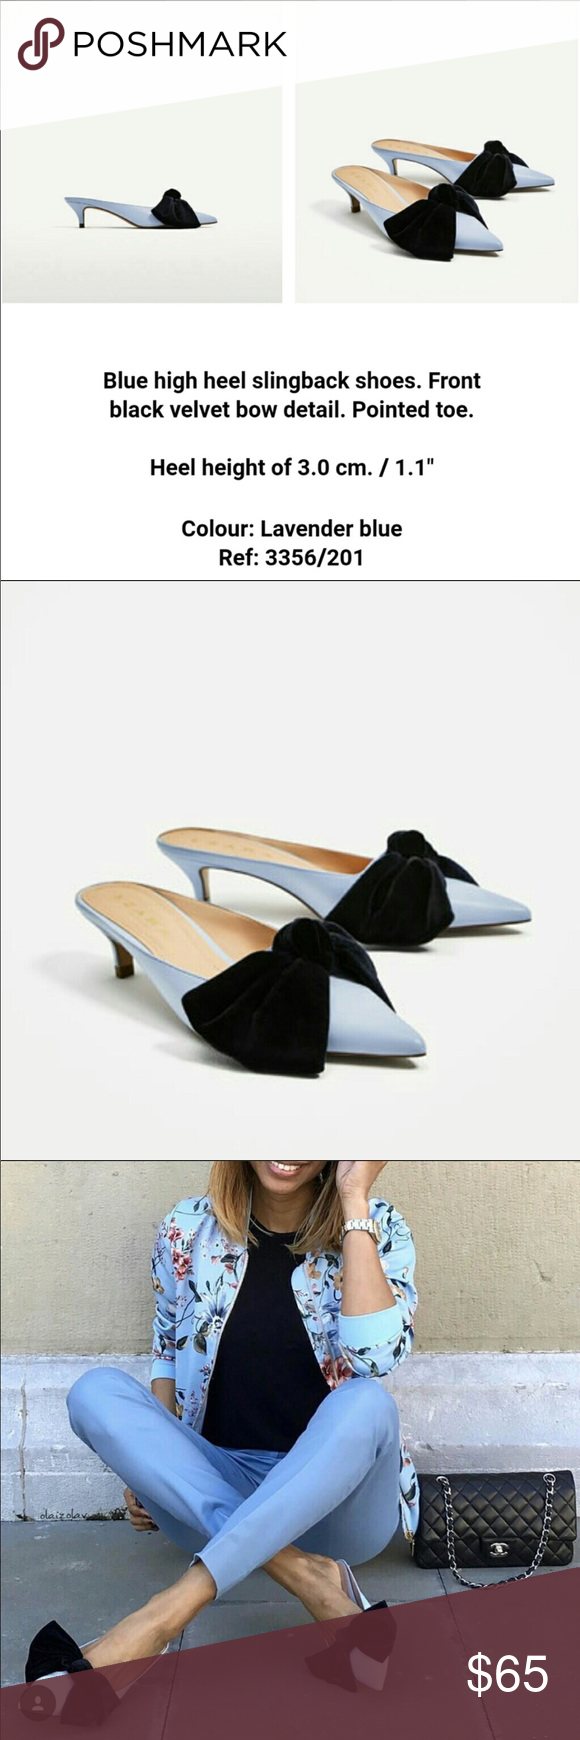 Zara Light Blue Kitten Heel Mules With Bow Heeled Mules Kitten Heels Zara